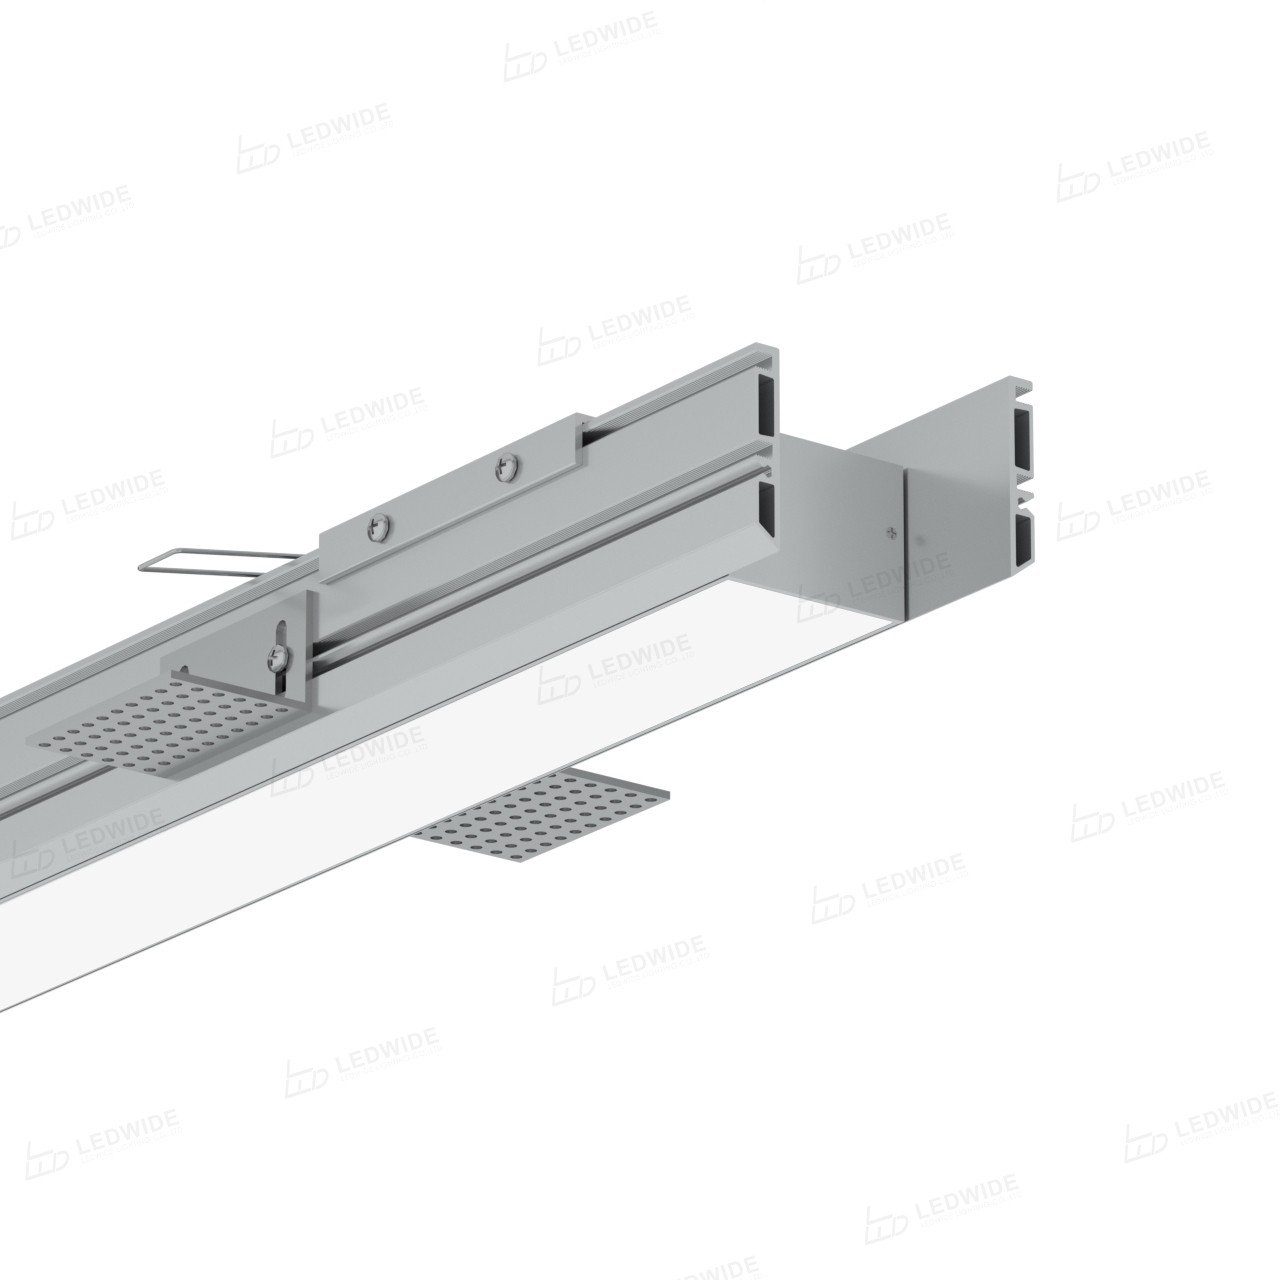 TR50 Led Aluminum Profile Manufacturers, TR50 Led Aluminum Profile Factory, Supply TR50 Led Aluminum Profile